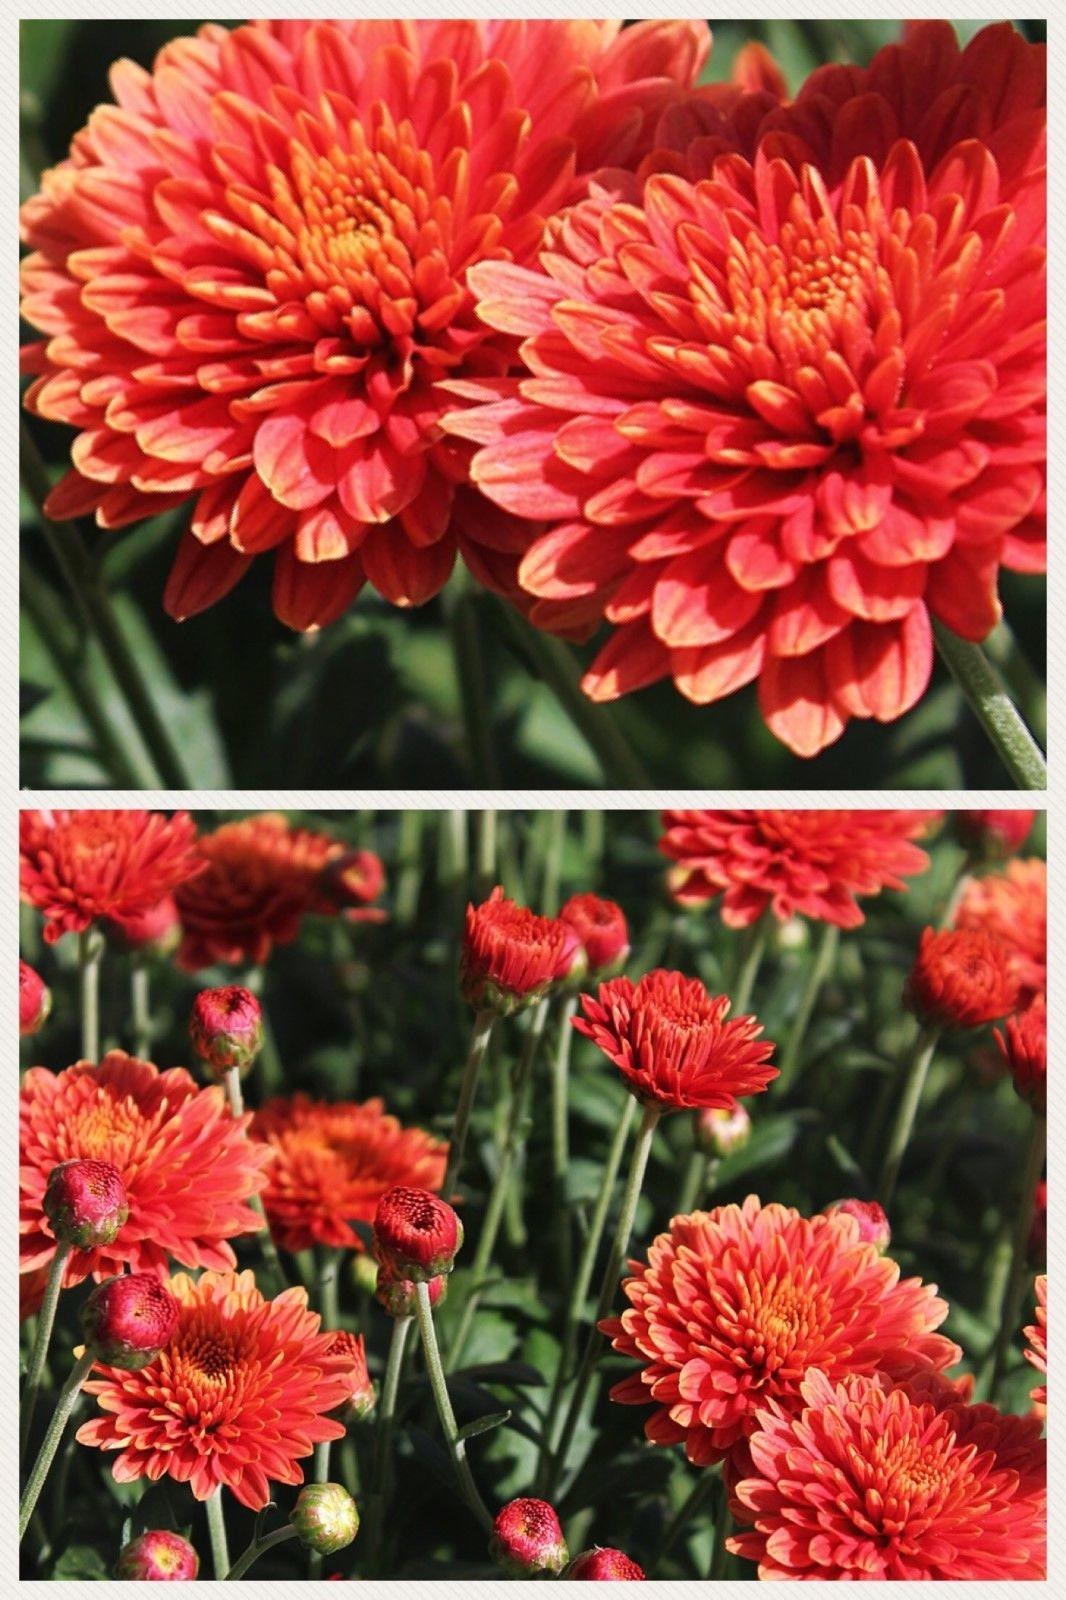 Red Cushion Mum Chrysanthemum Seeds 400 Seeds 12 Ounce 1 Etsy